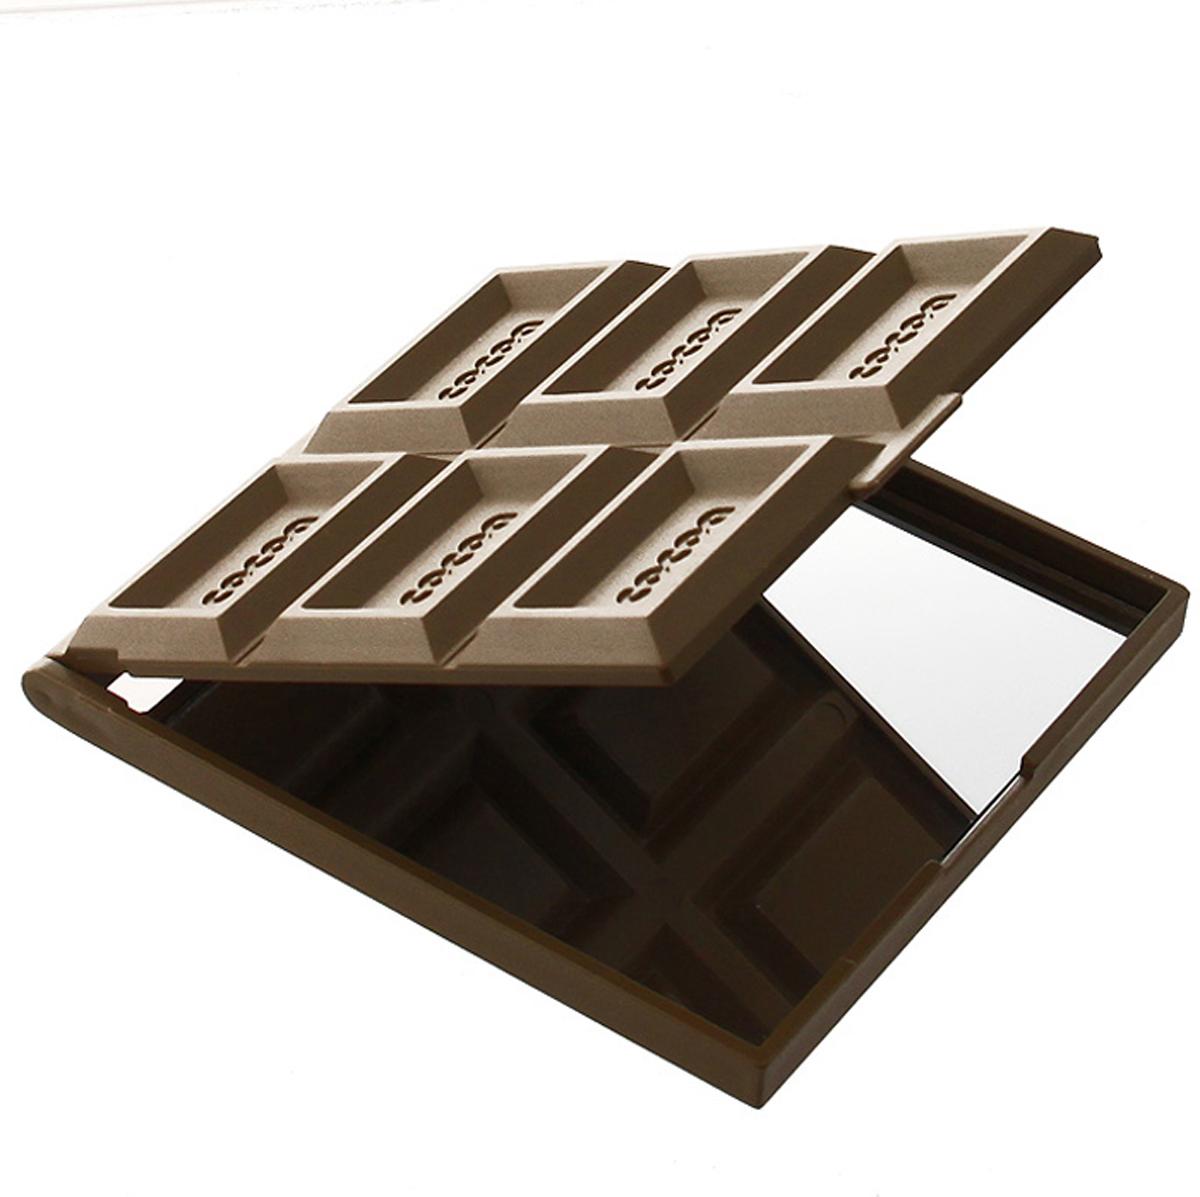 "Зеркало ""Светлый шоколад"", 7,5 см х 8,5 см"